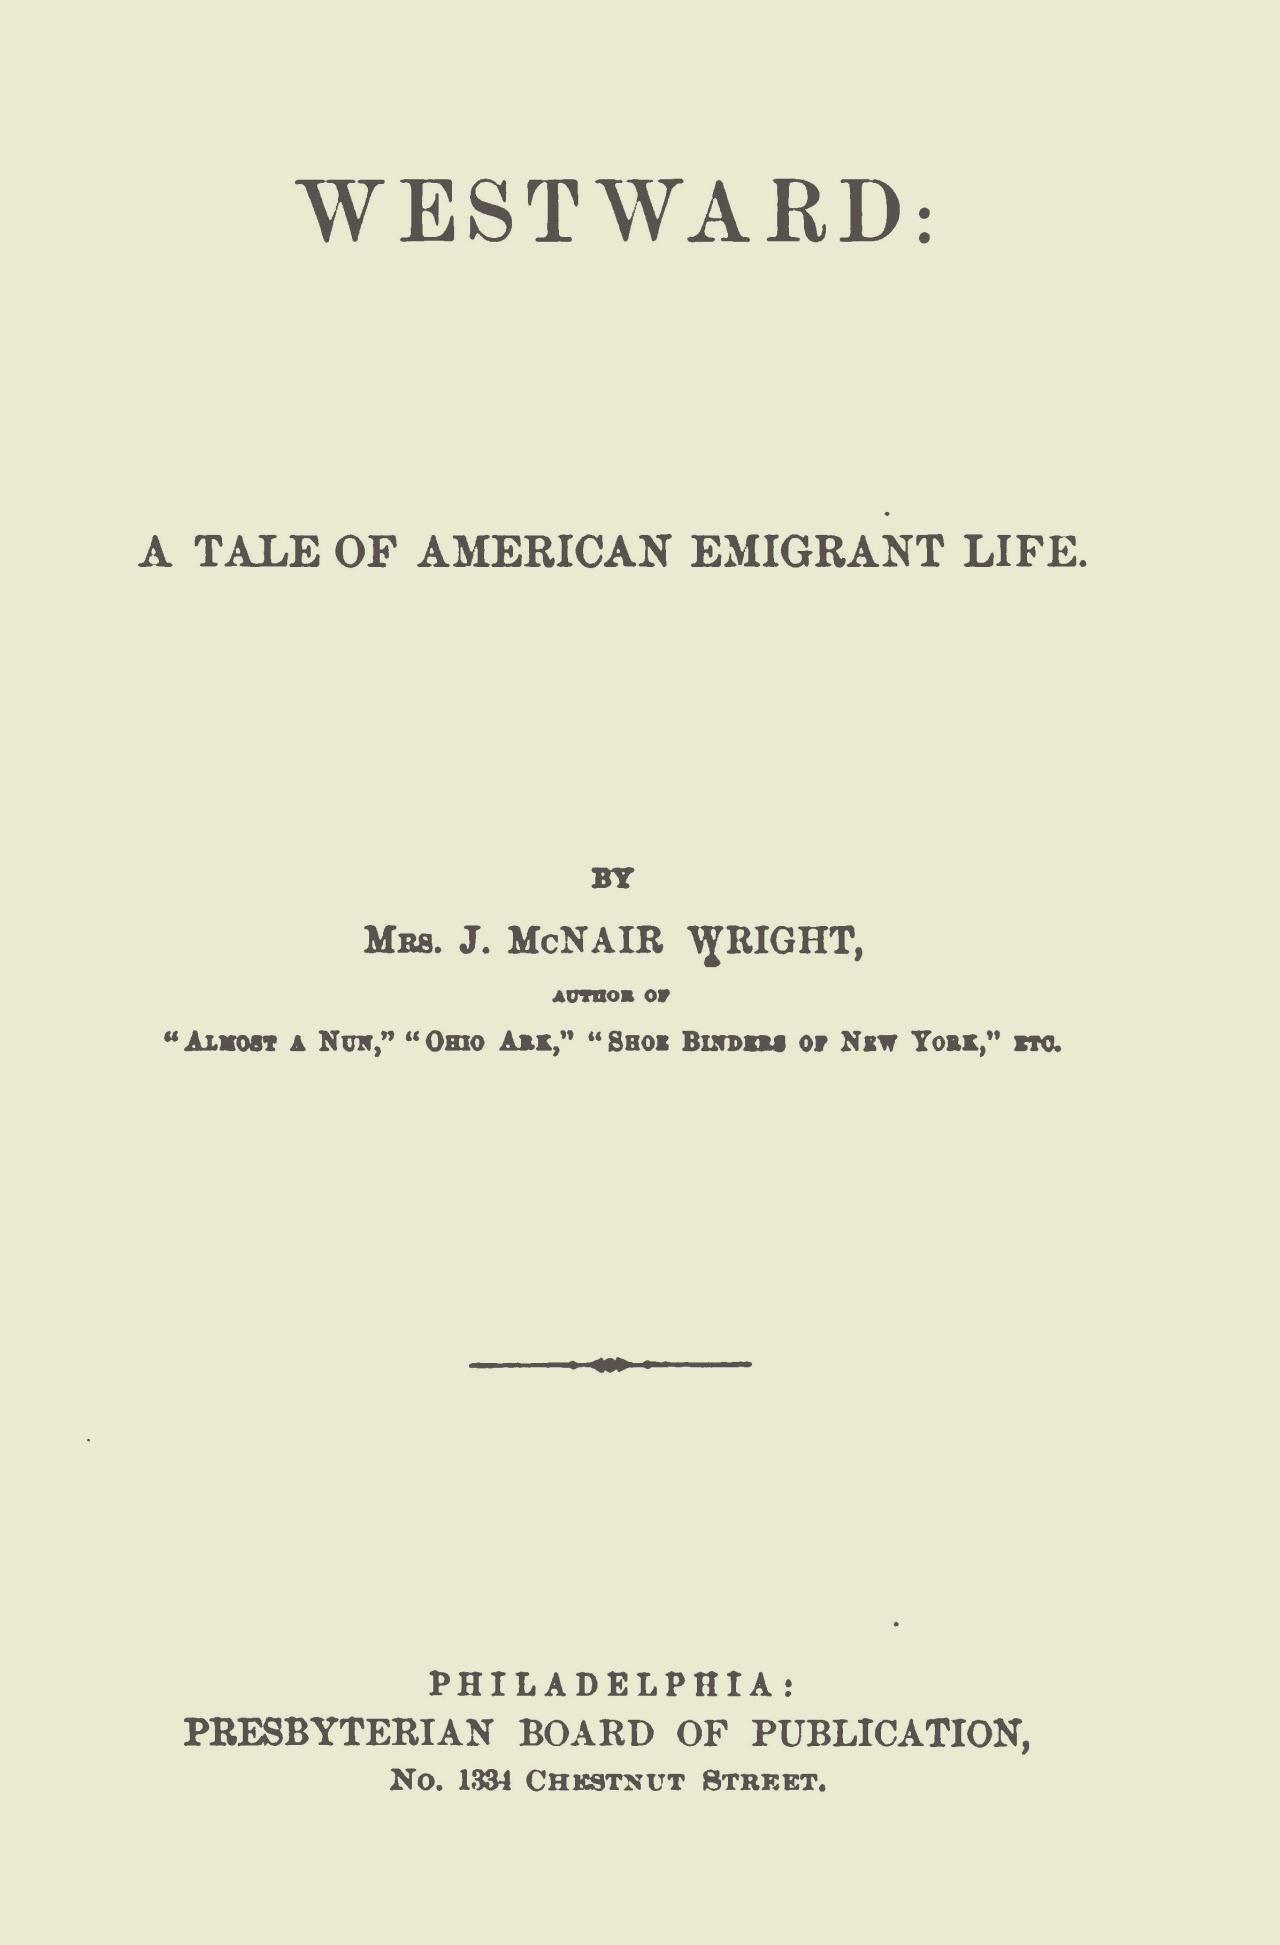 Wright, Julia McNair, Westward Title Page.jpg